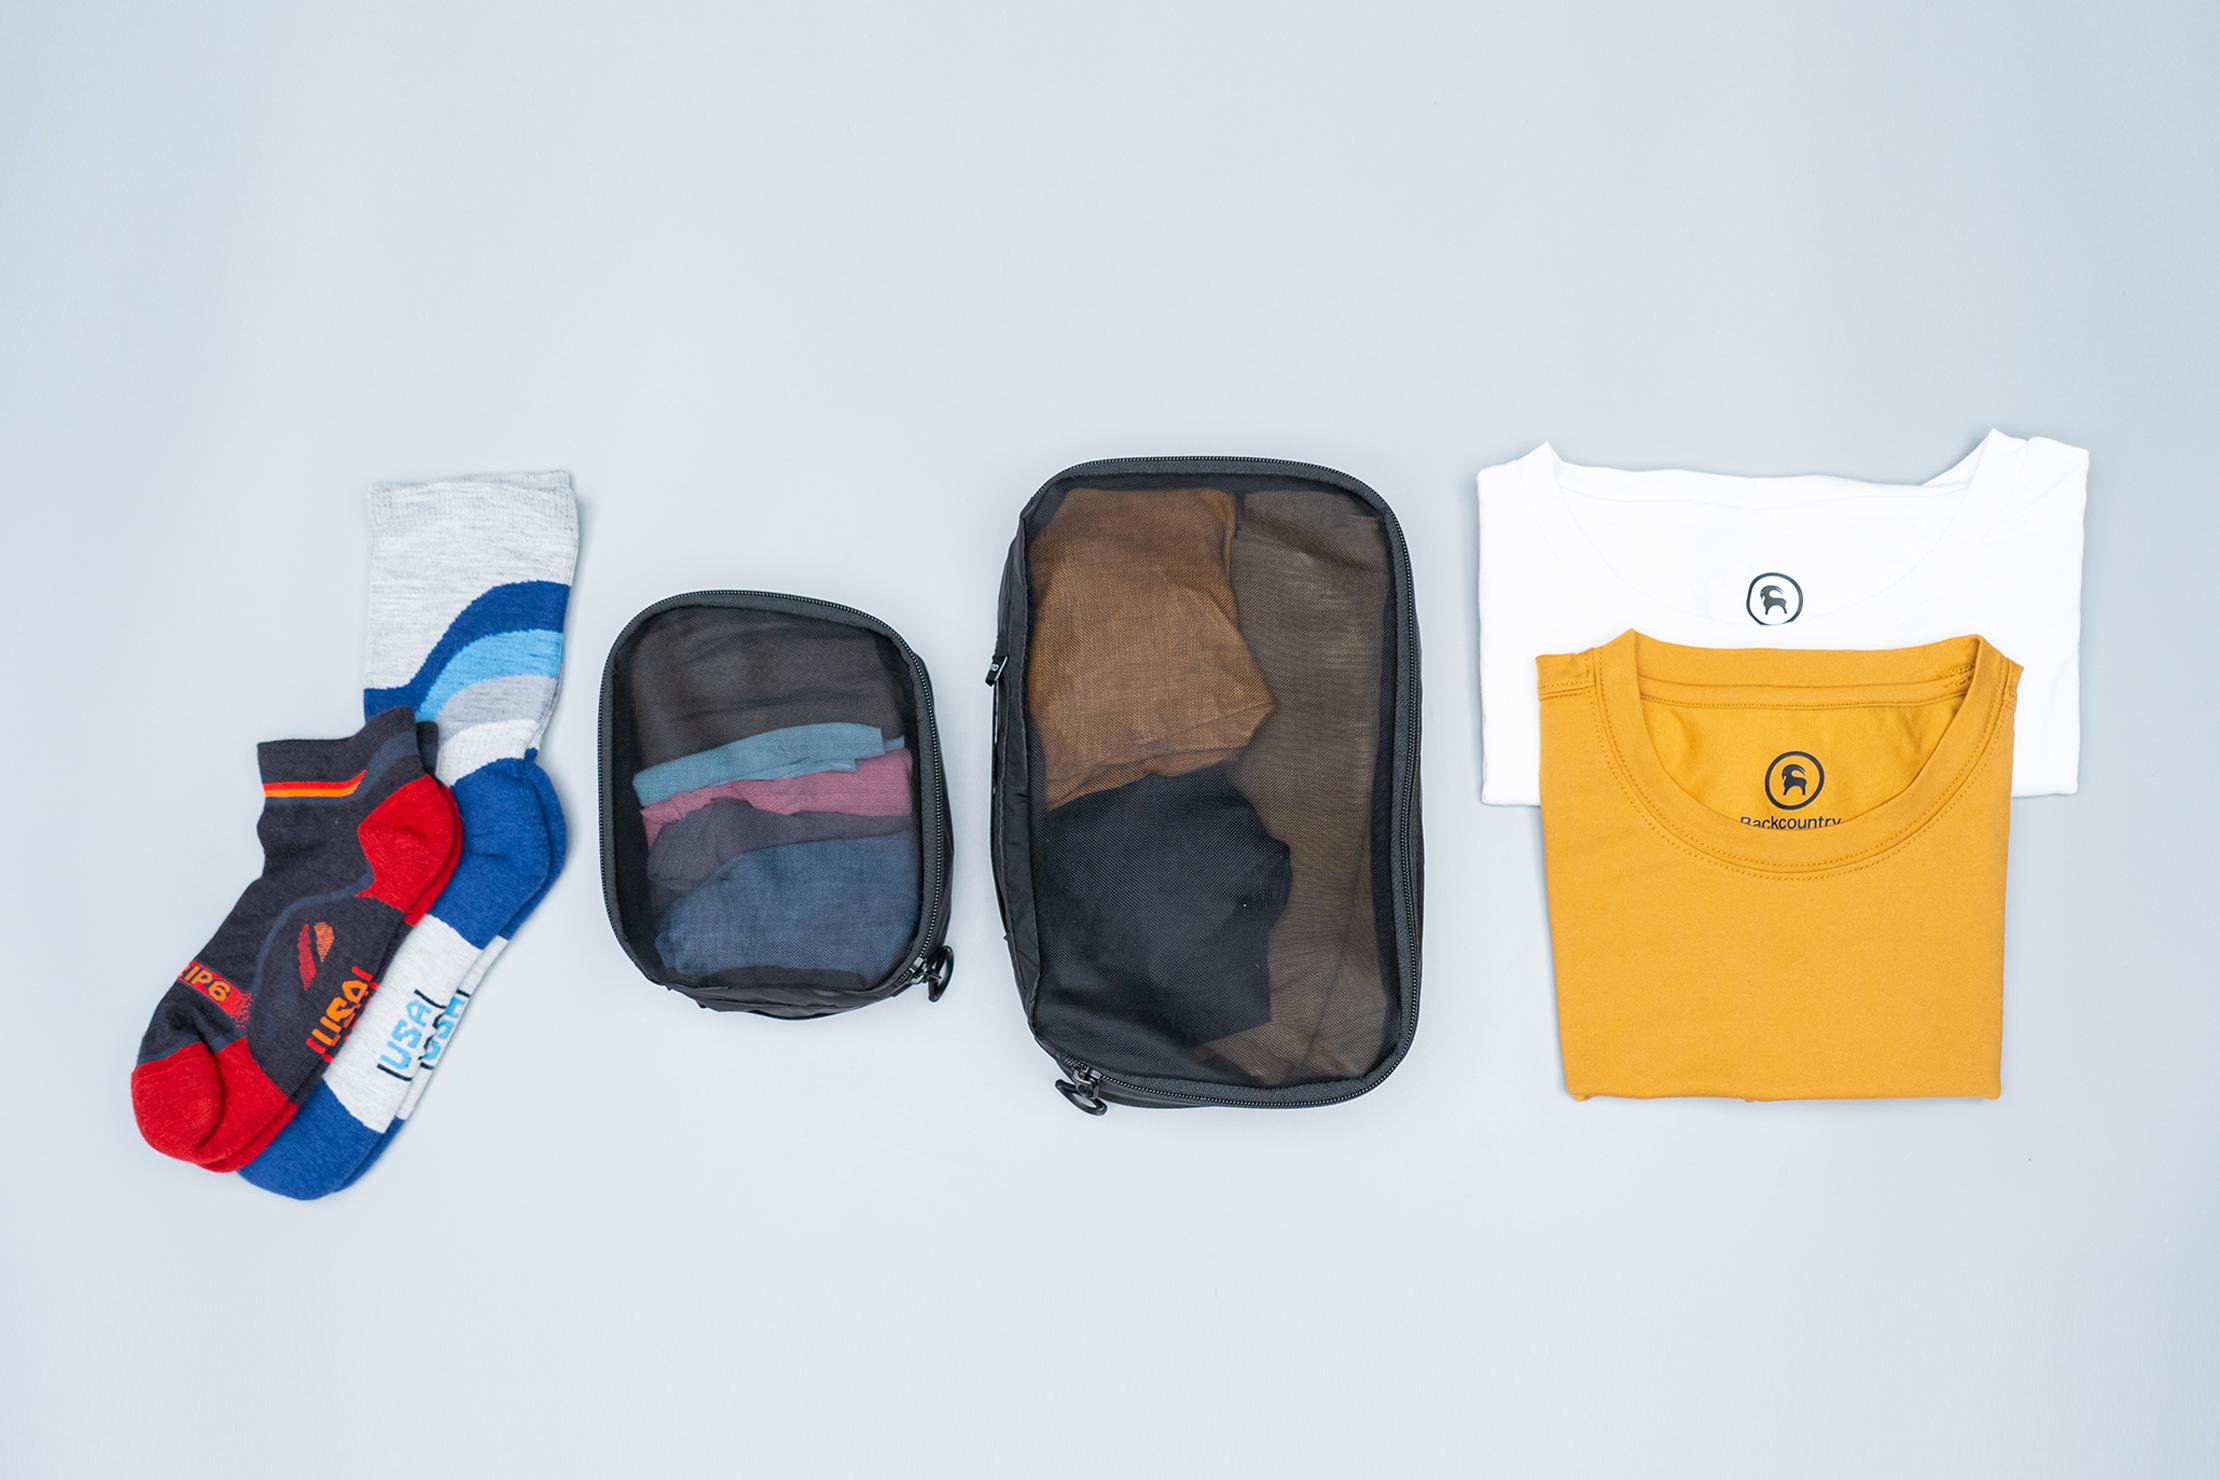 WANDRD Packing Cubes Flat Lay 2